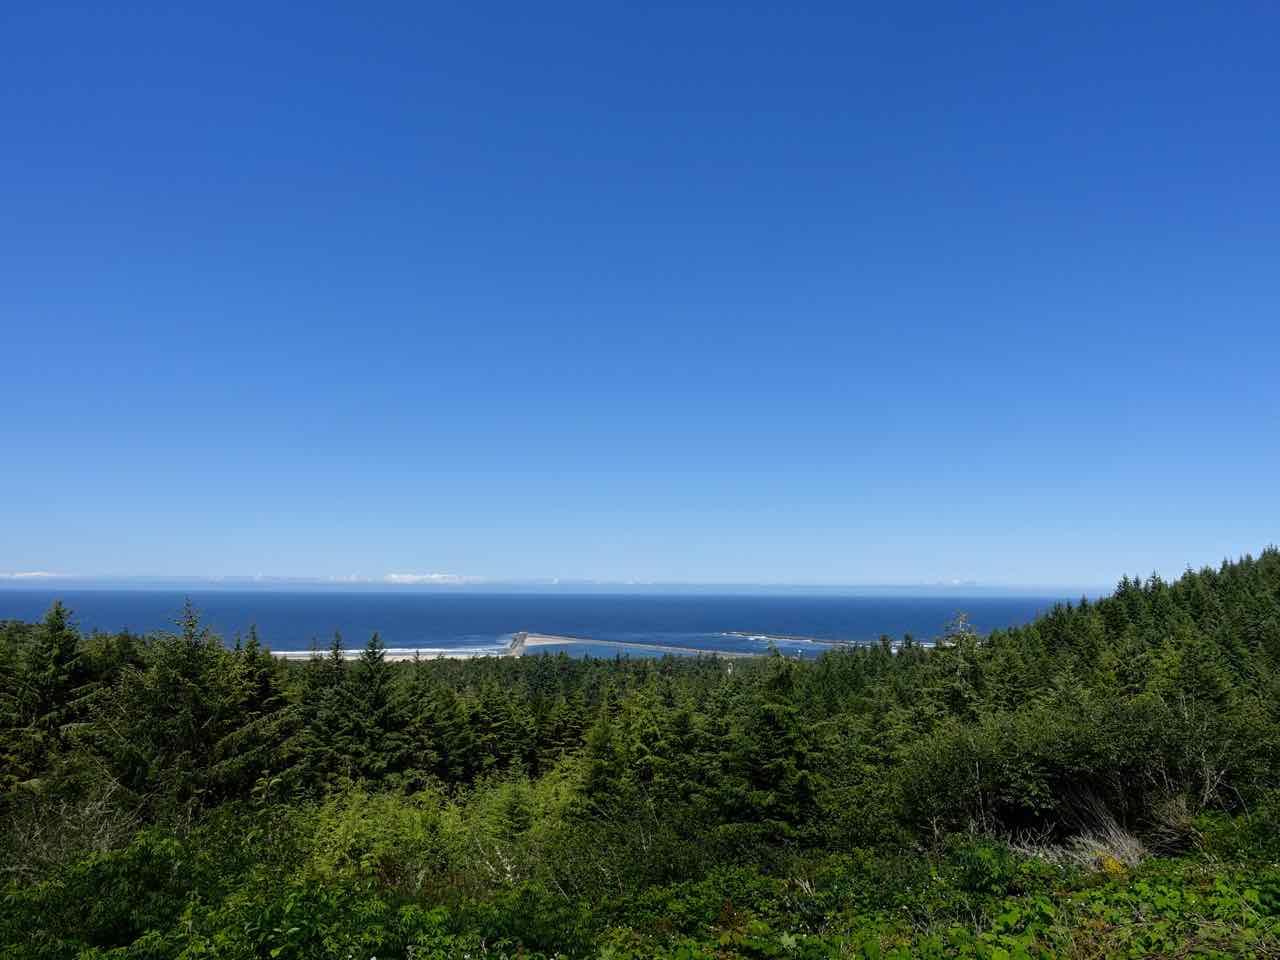 West Coast Road Trip: Umpqua Lighthouse State Park in Reedsport | www.rtwgirl.com